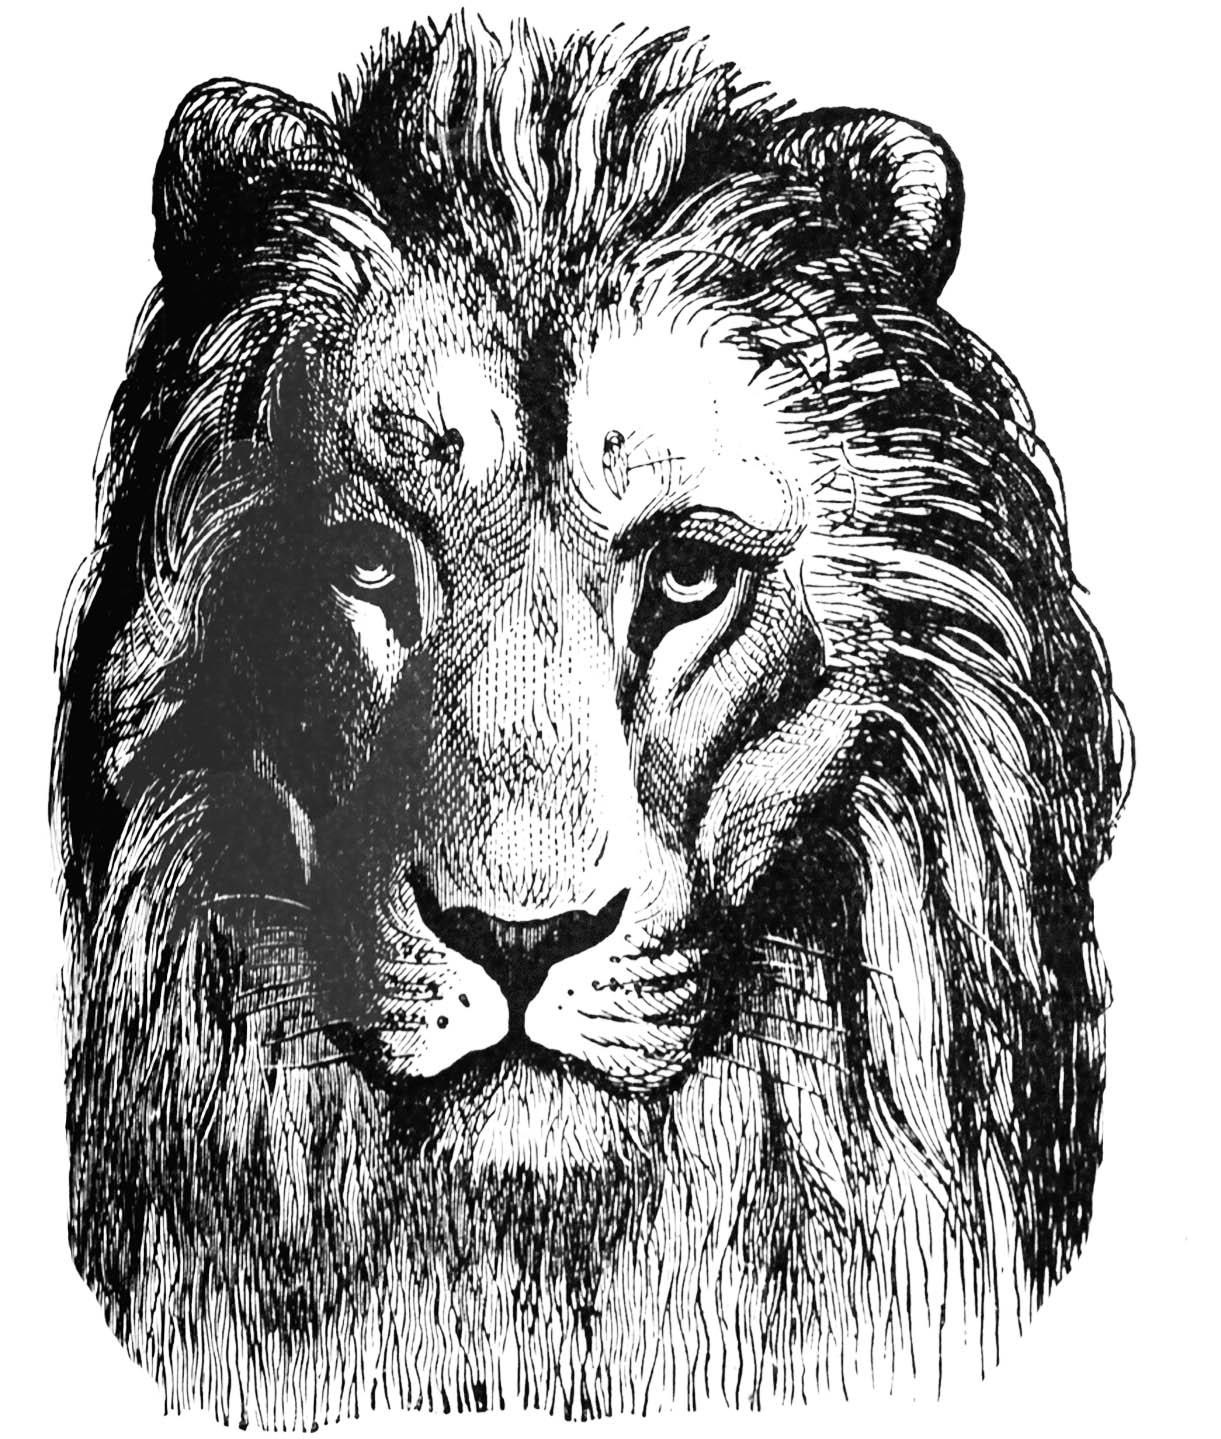 http://2.bp.blogspot.com/-NB3pthoEs6E/U6mFSNL6blI/AAAAAAAAOSY/bD-AjC1o9wQ/s1600/01+free+digital+stamp_lion+head+clip+art.jpg